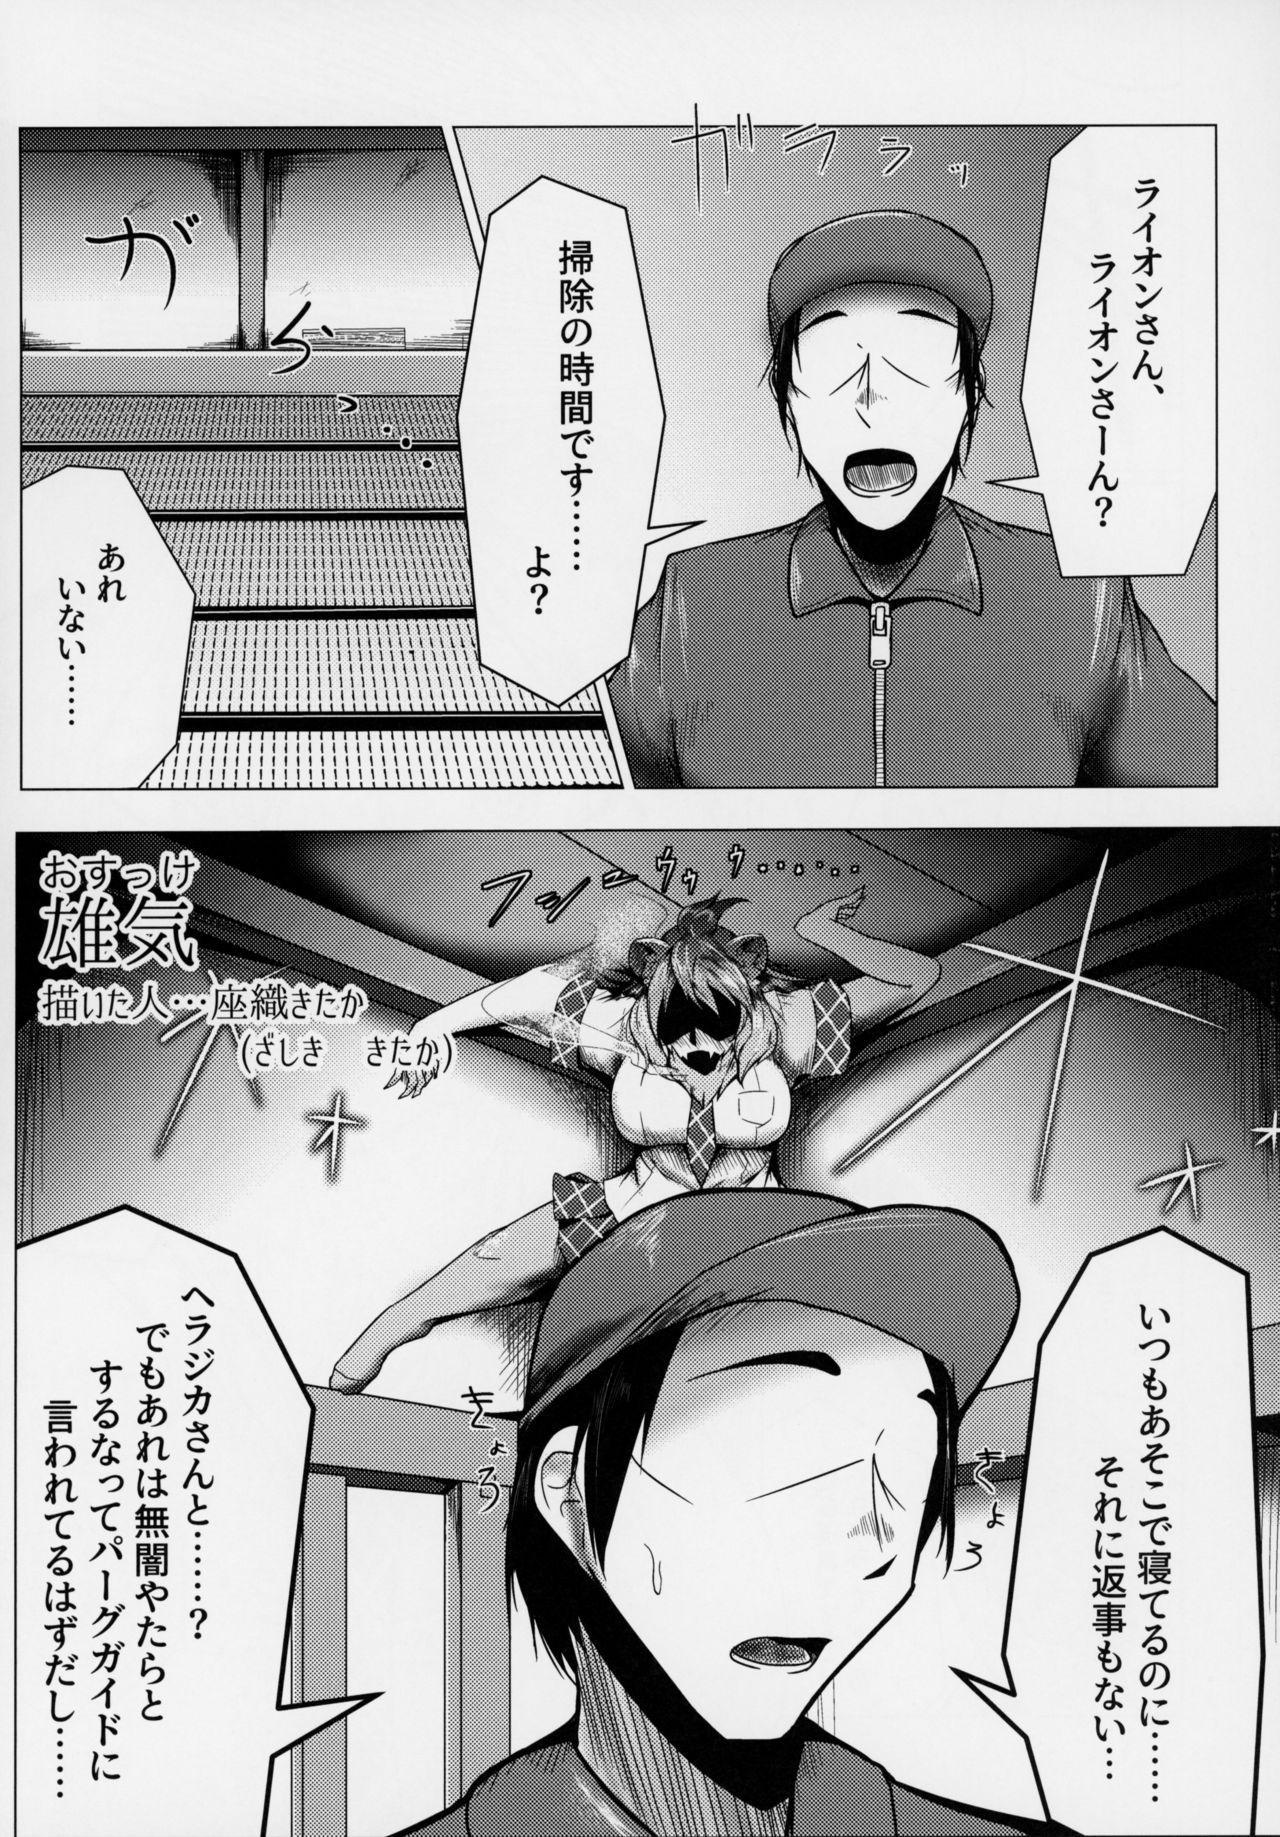 Friends Gyaku Rape Goudoushi 37